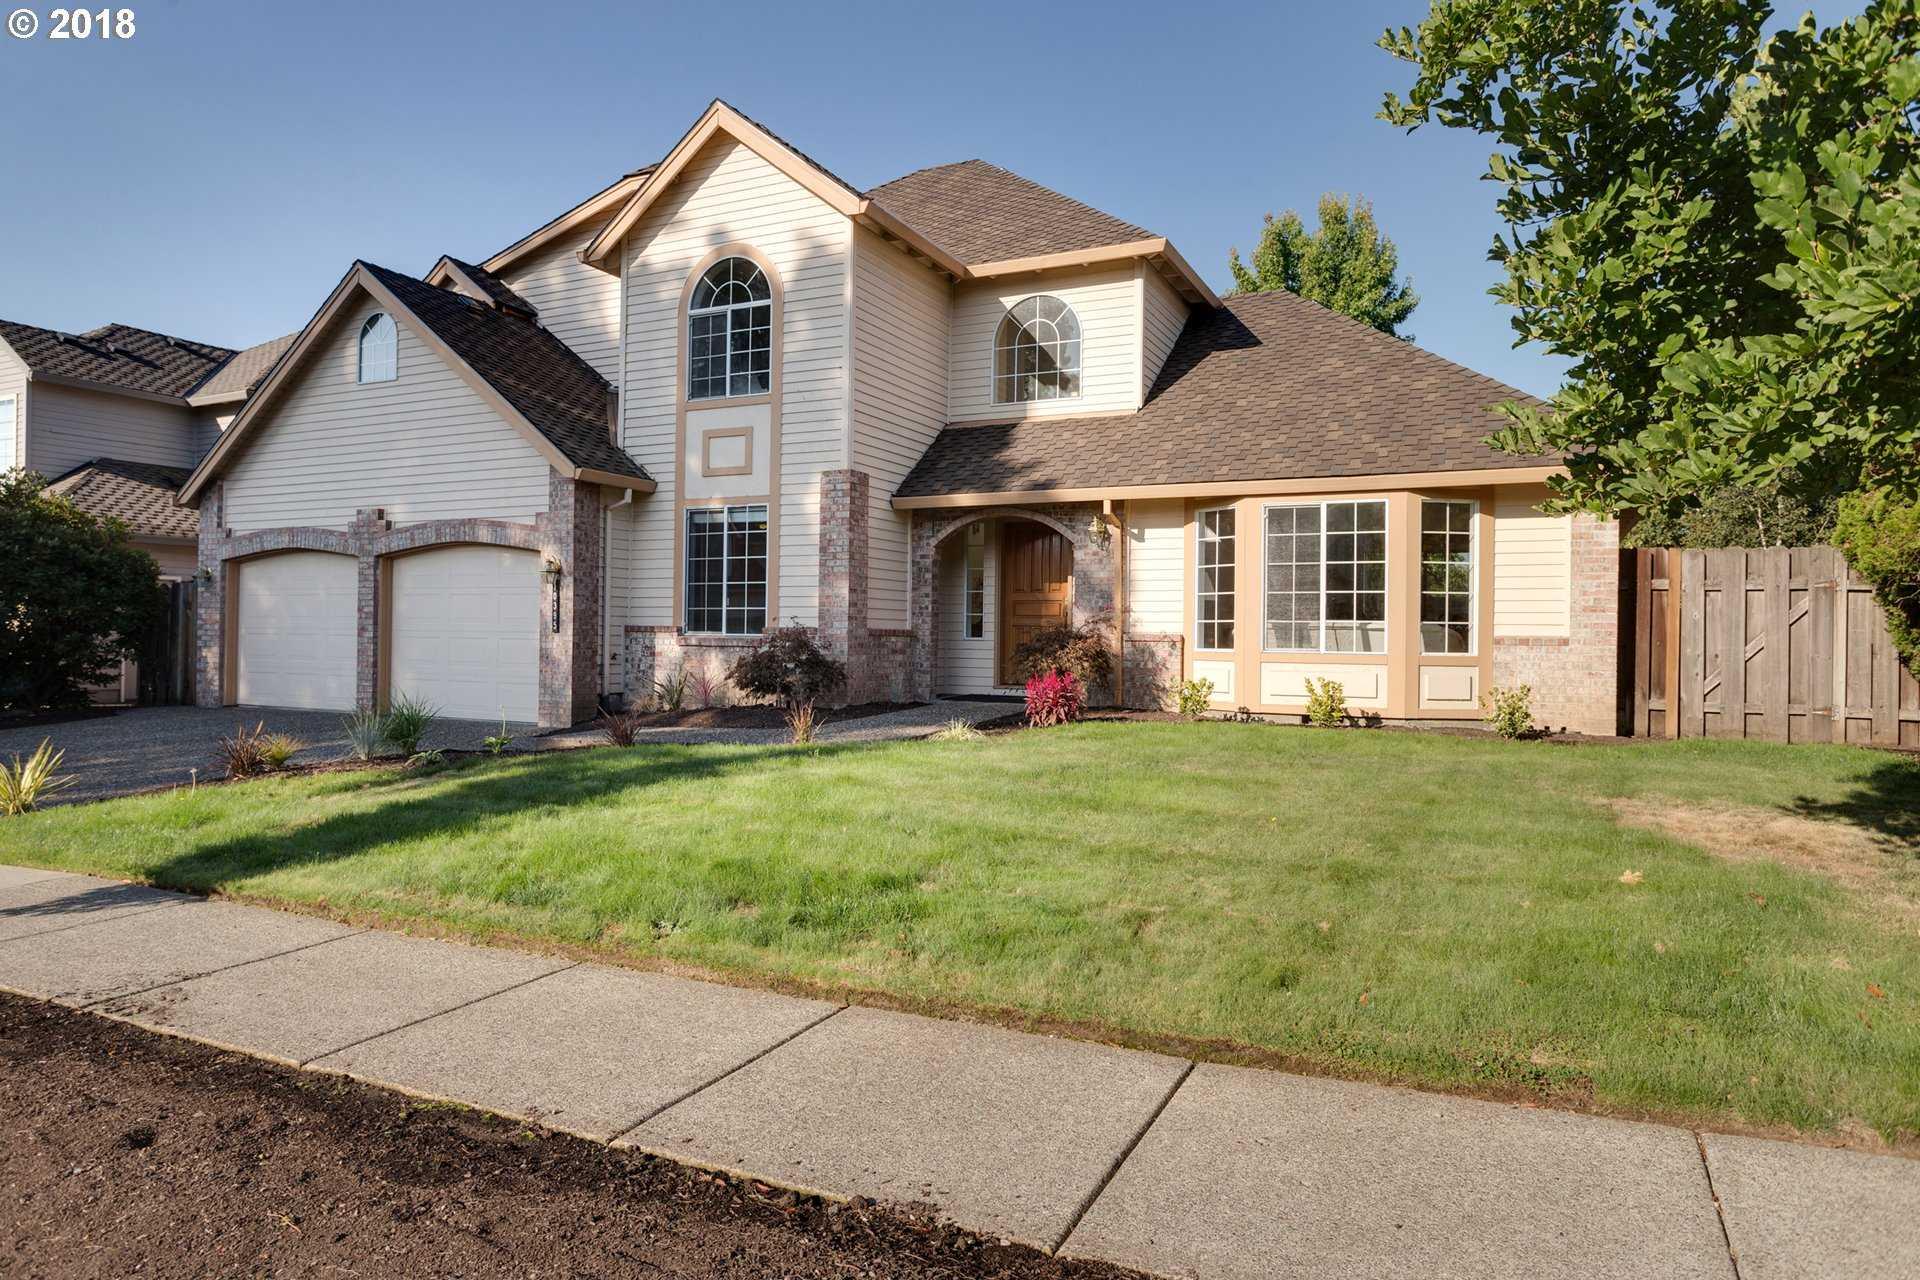 $475,000 - 4Br/3Ba -  for Sale in Hiteon Area, Beaverton